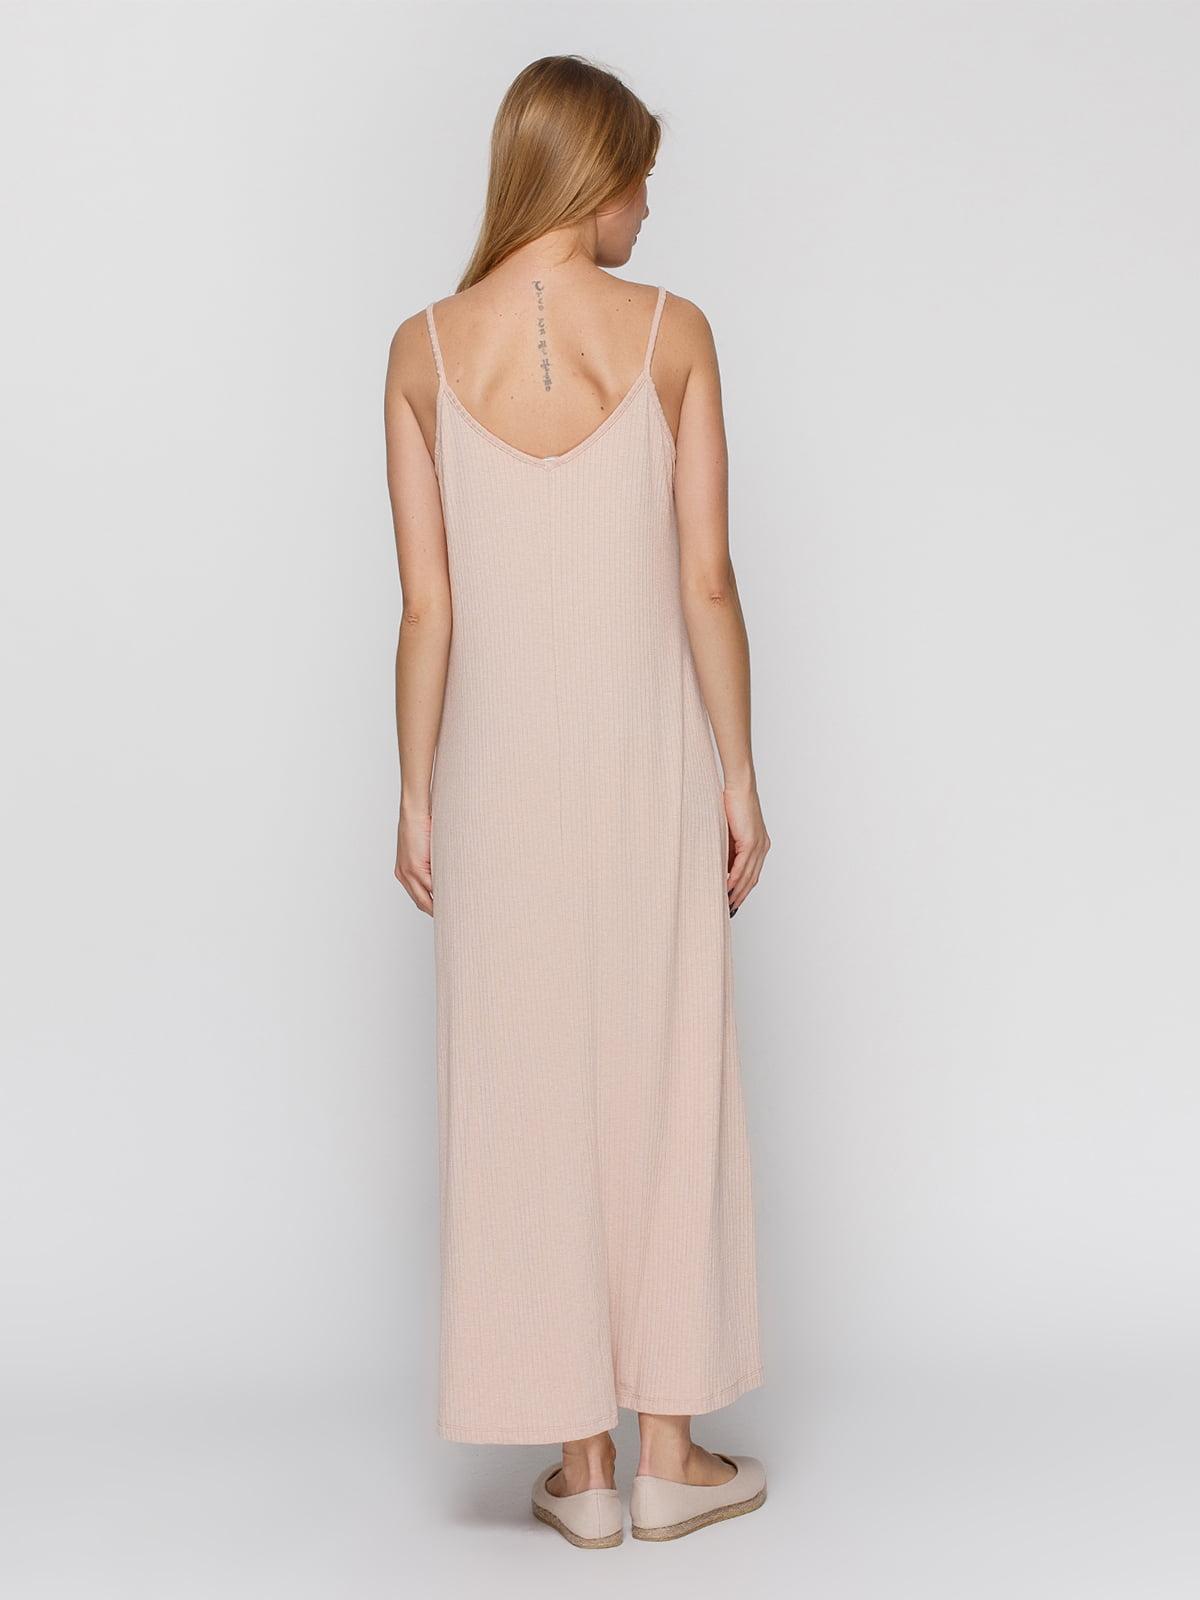 Платье бежевое | 3927242 | фото 2